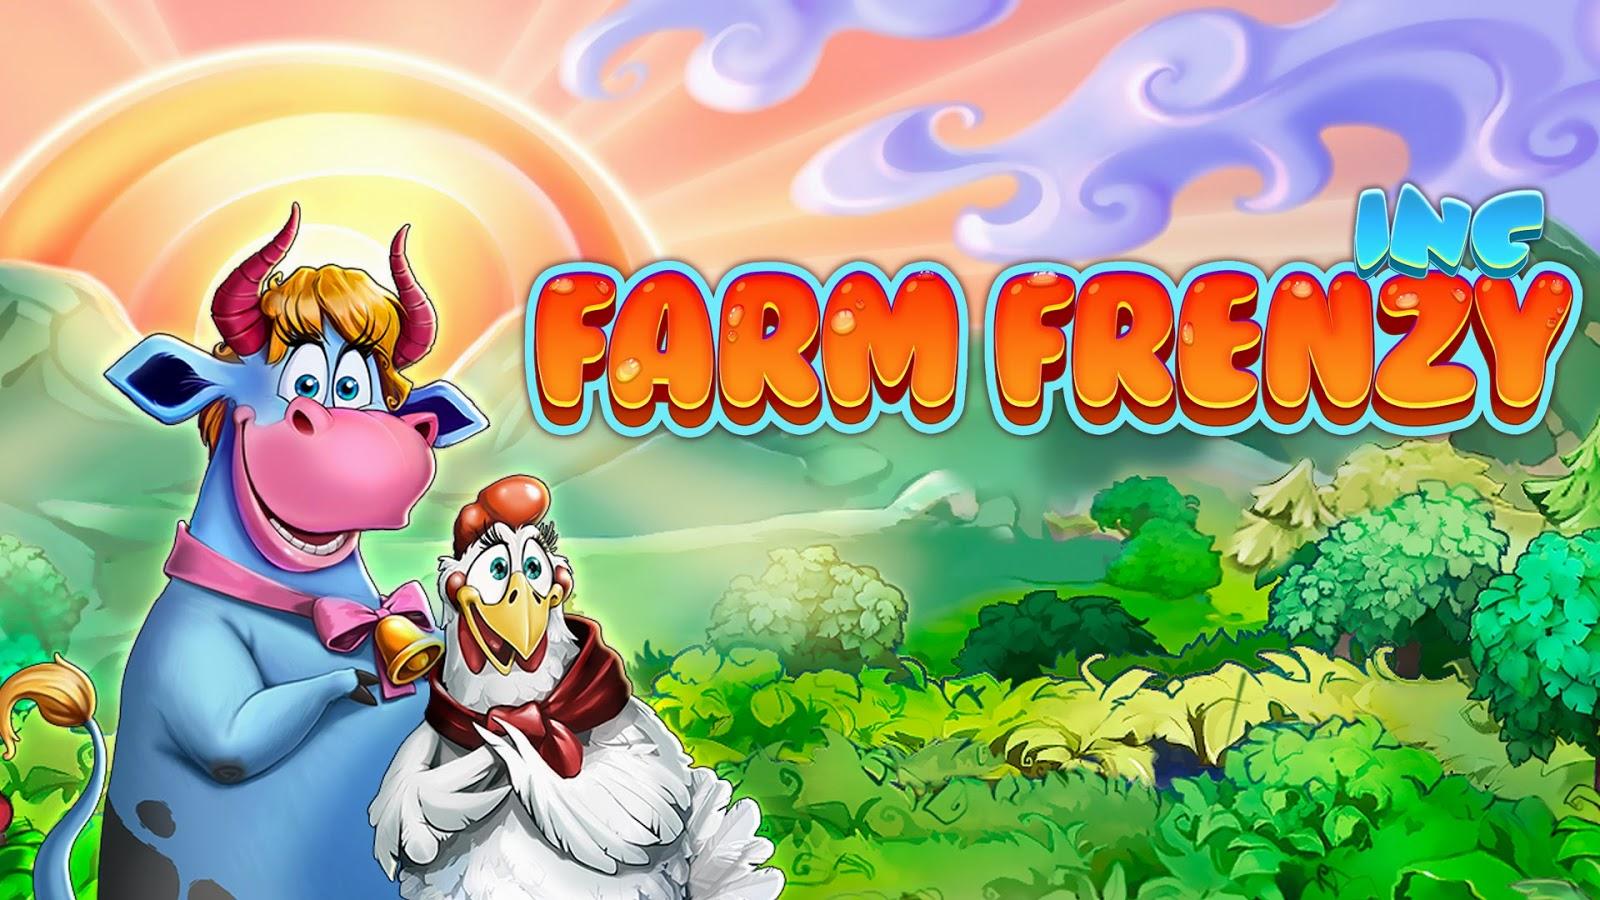 Farm Frenzy Inc v1 1 2 Apk + OBB Data ~ Andy Andro